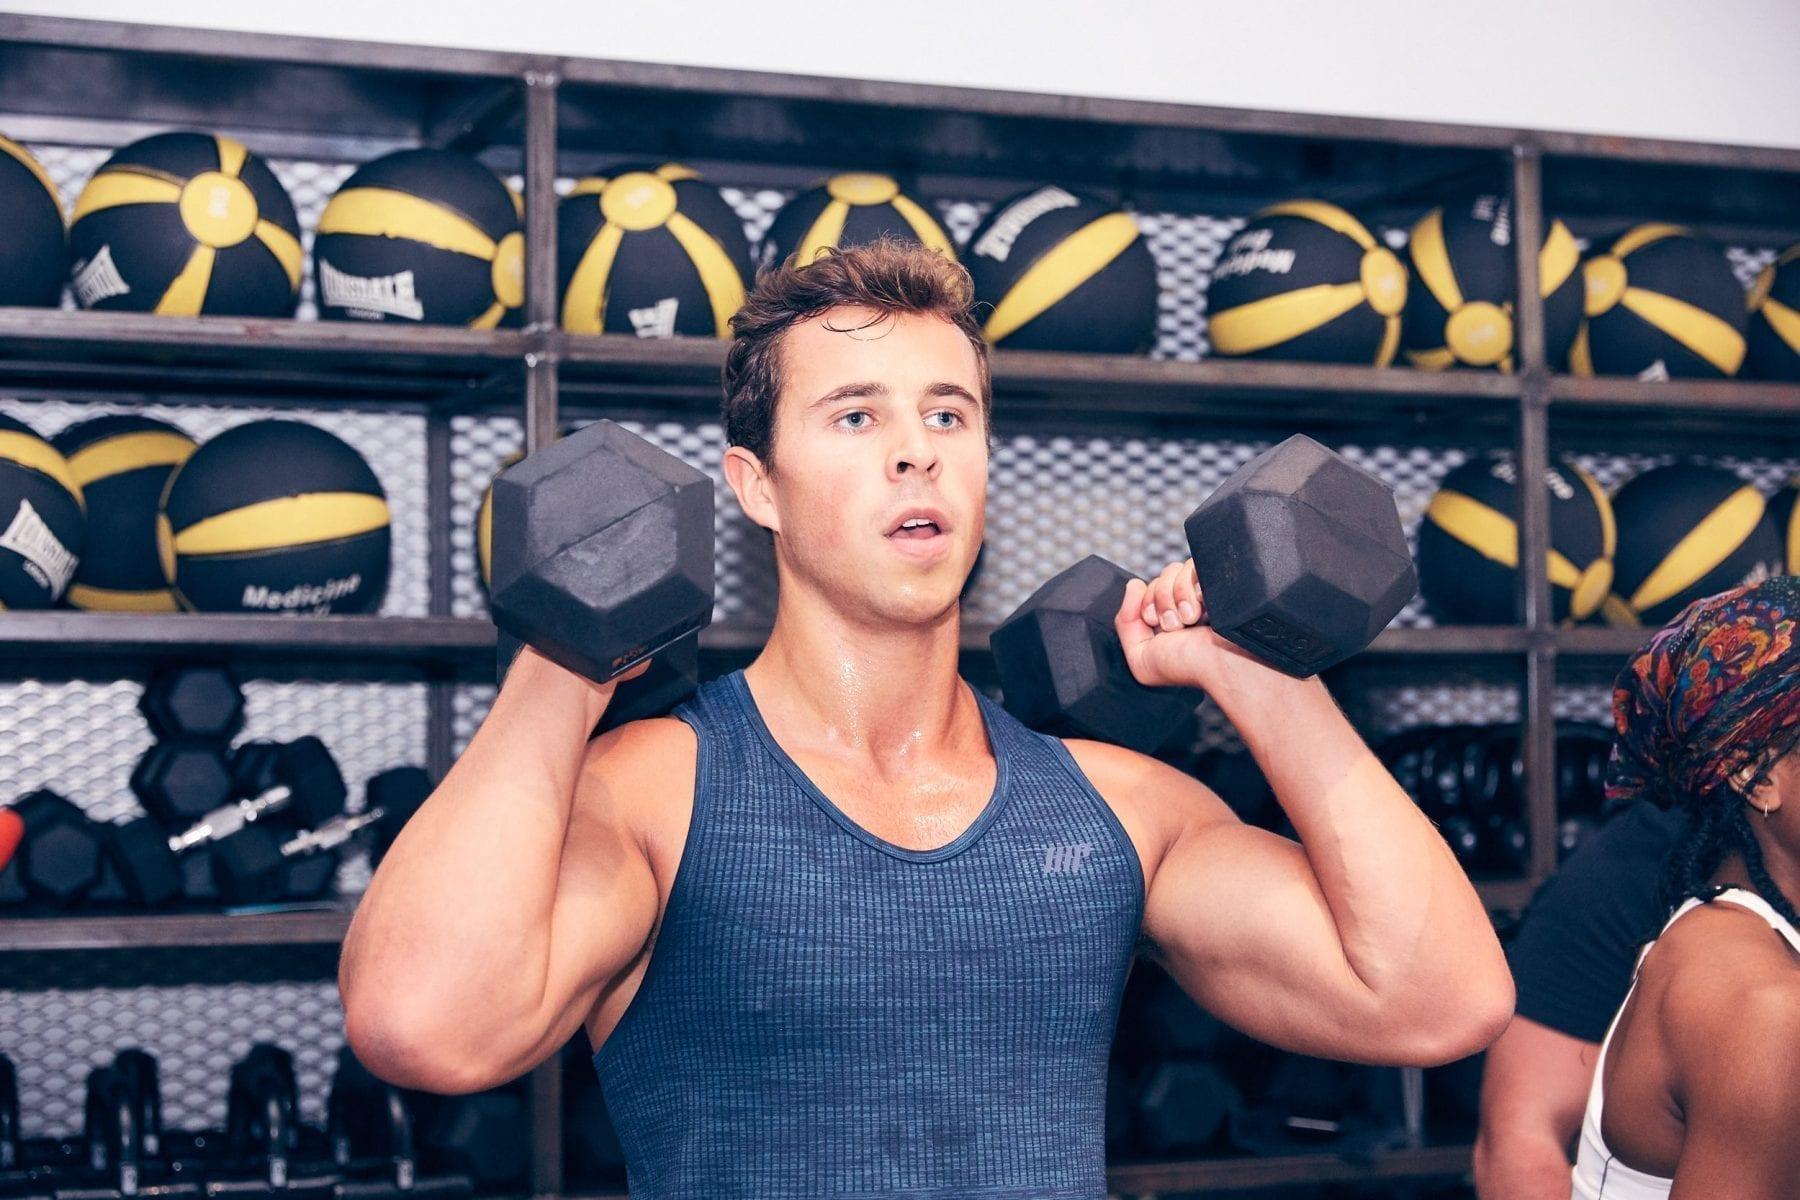 Shoulder Anatomy | 6 Exercises For Shoulder Size and Strength